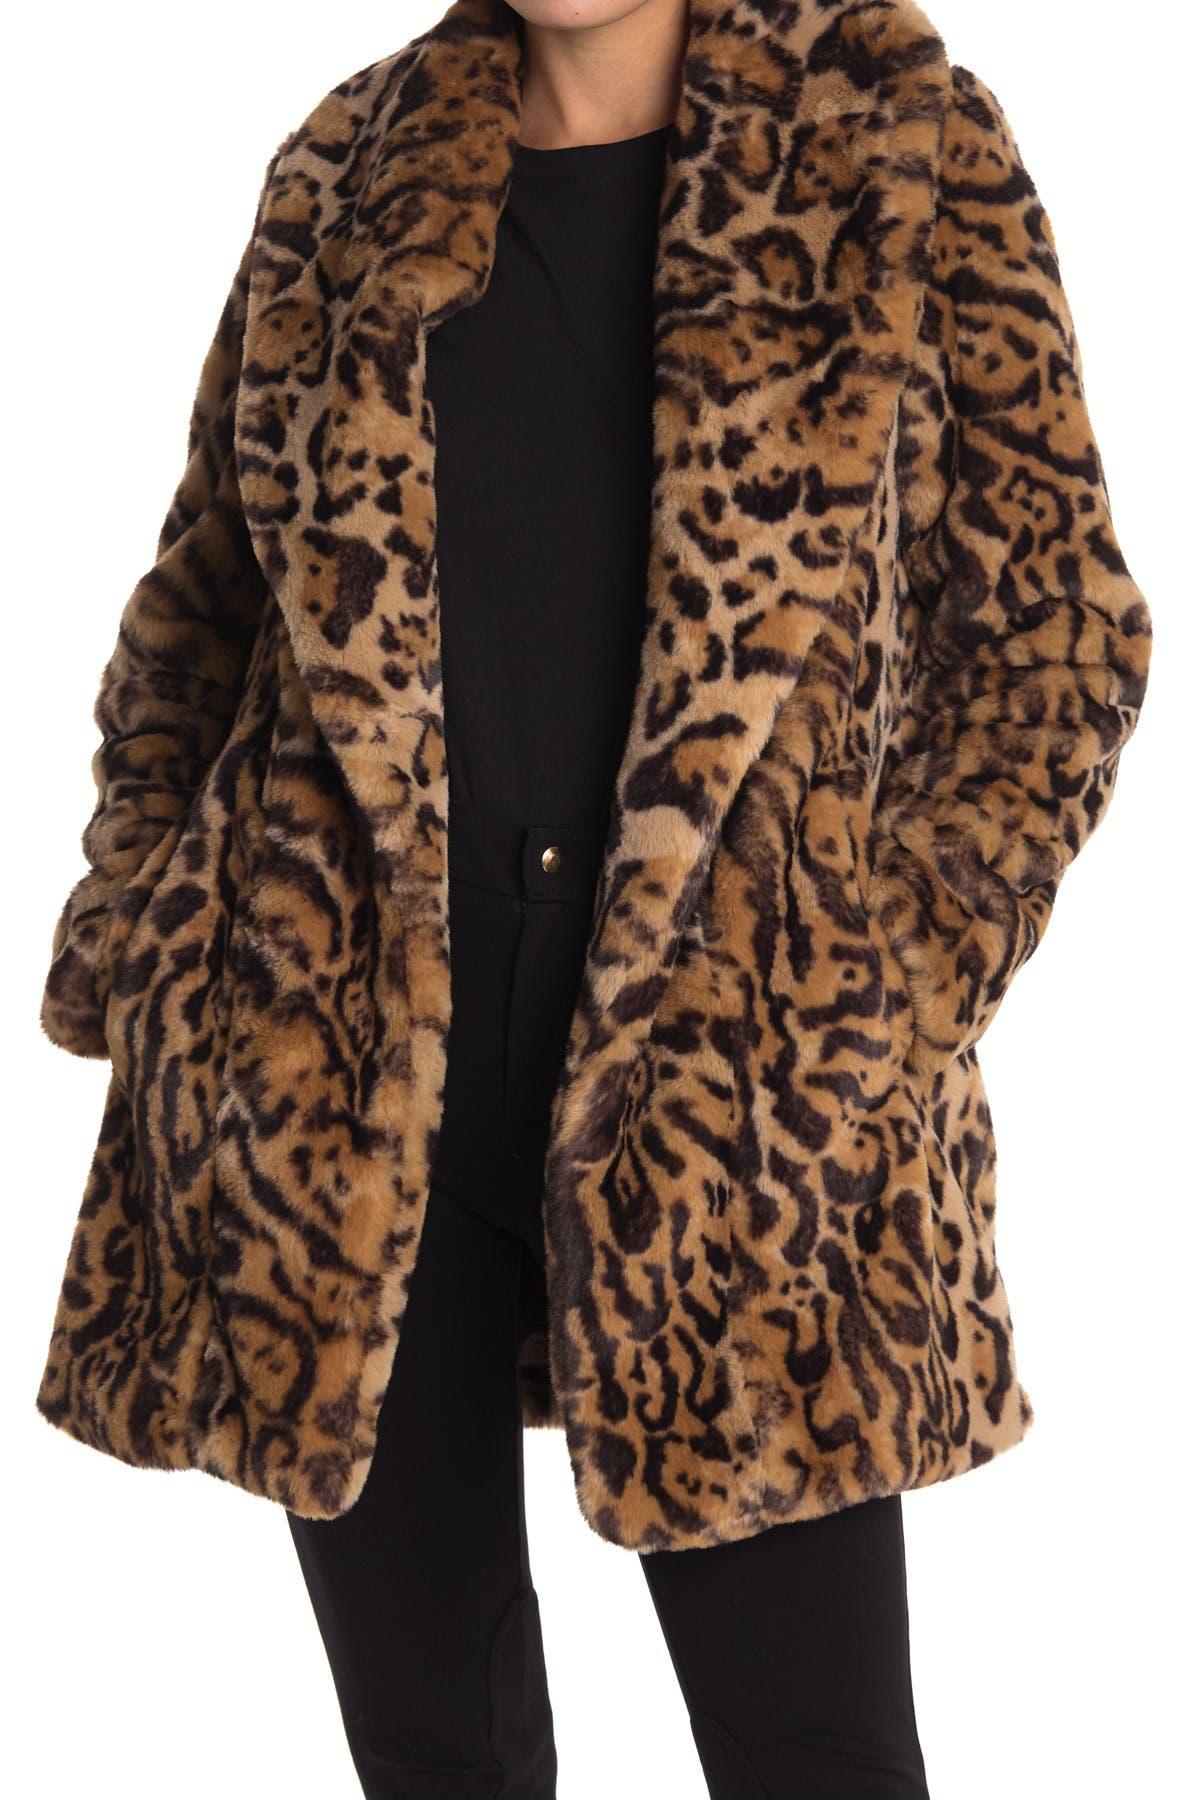 Image of BCBGMAXAZRIA Leopard Print Faux Fur Coat